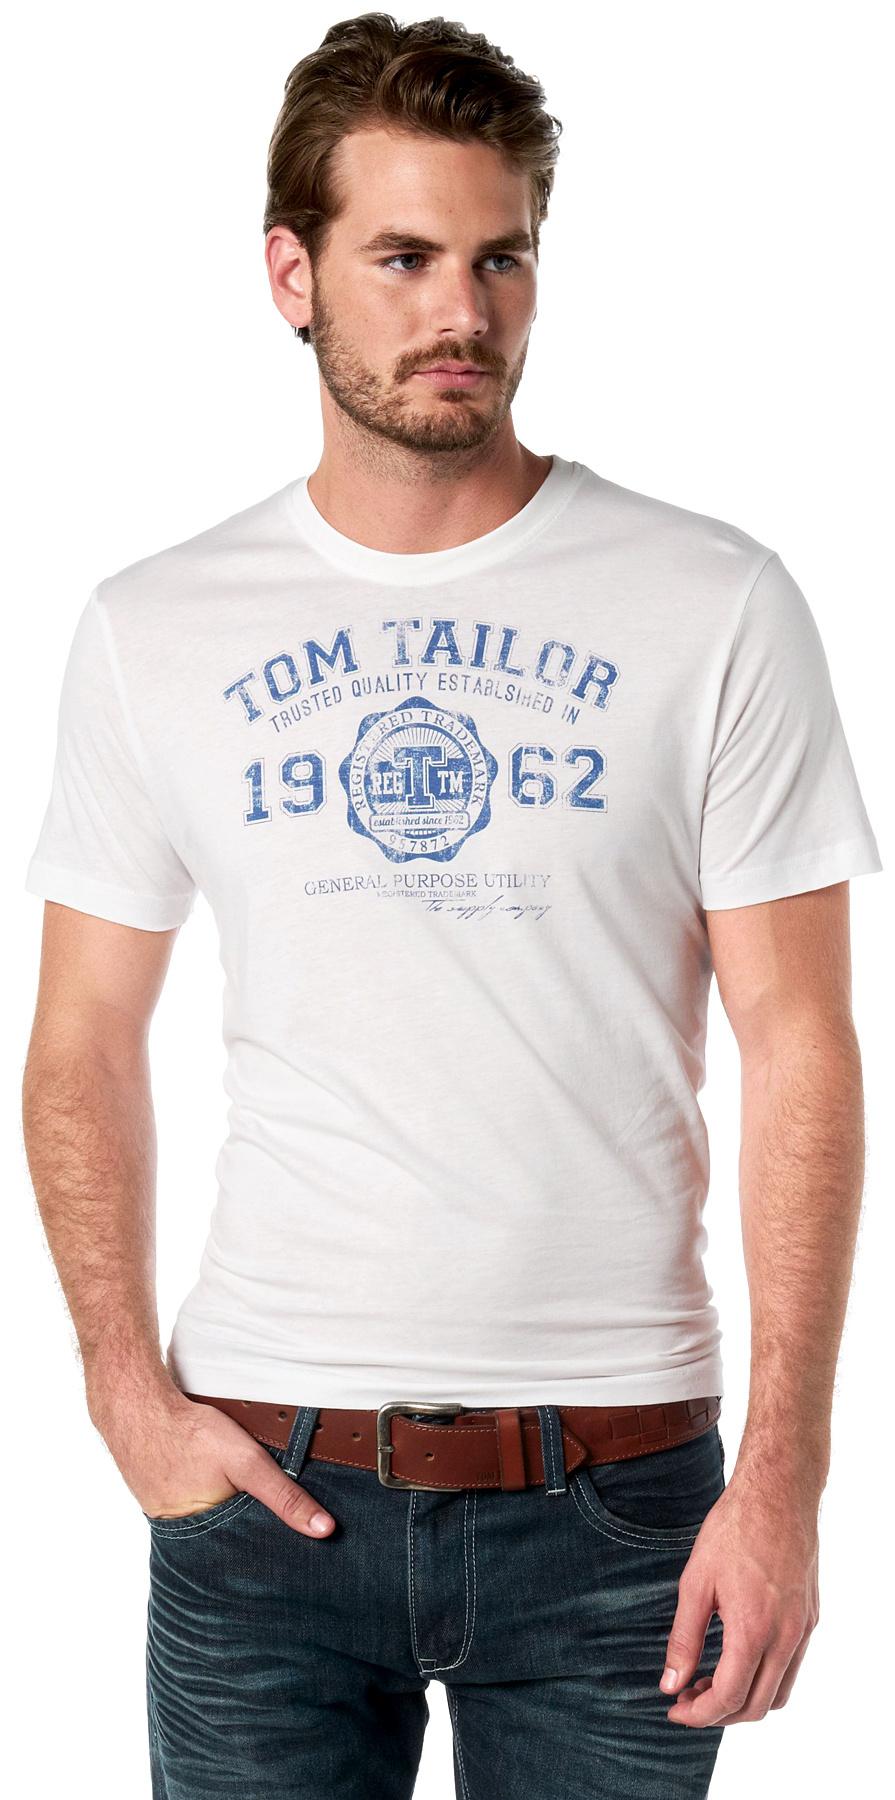 Tom Tailor pánské triko 10235490910/2000 Bílá XL